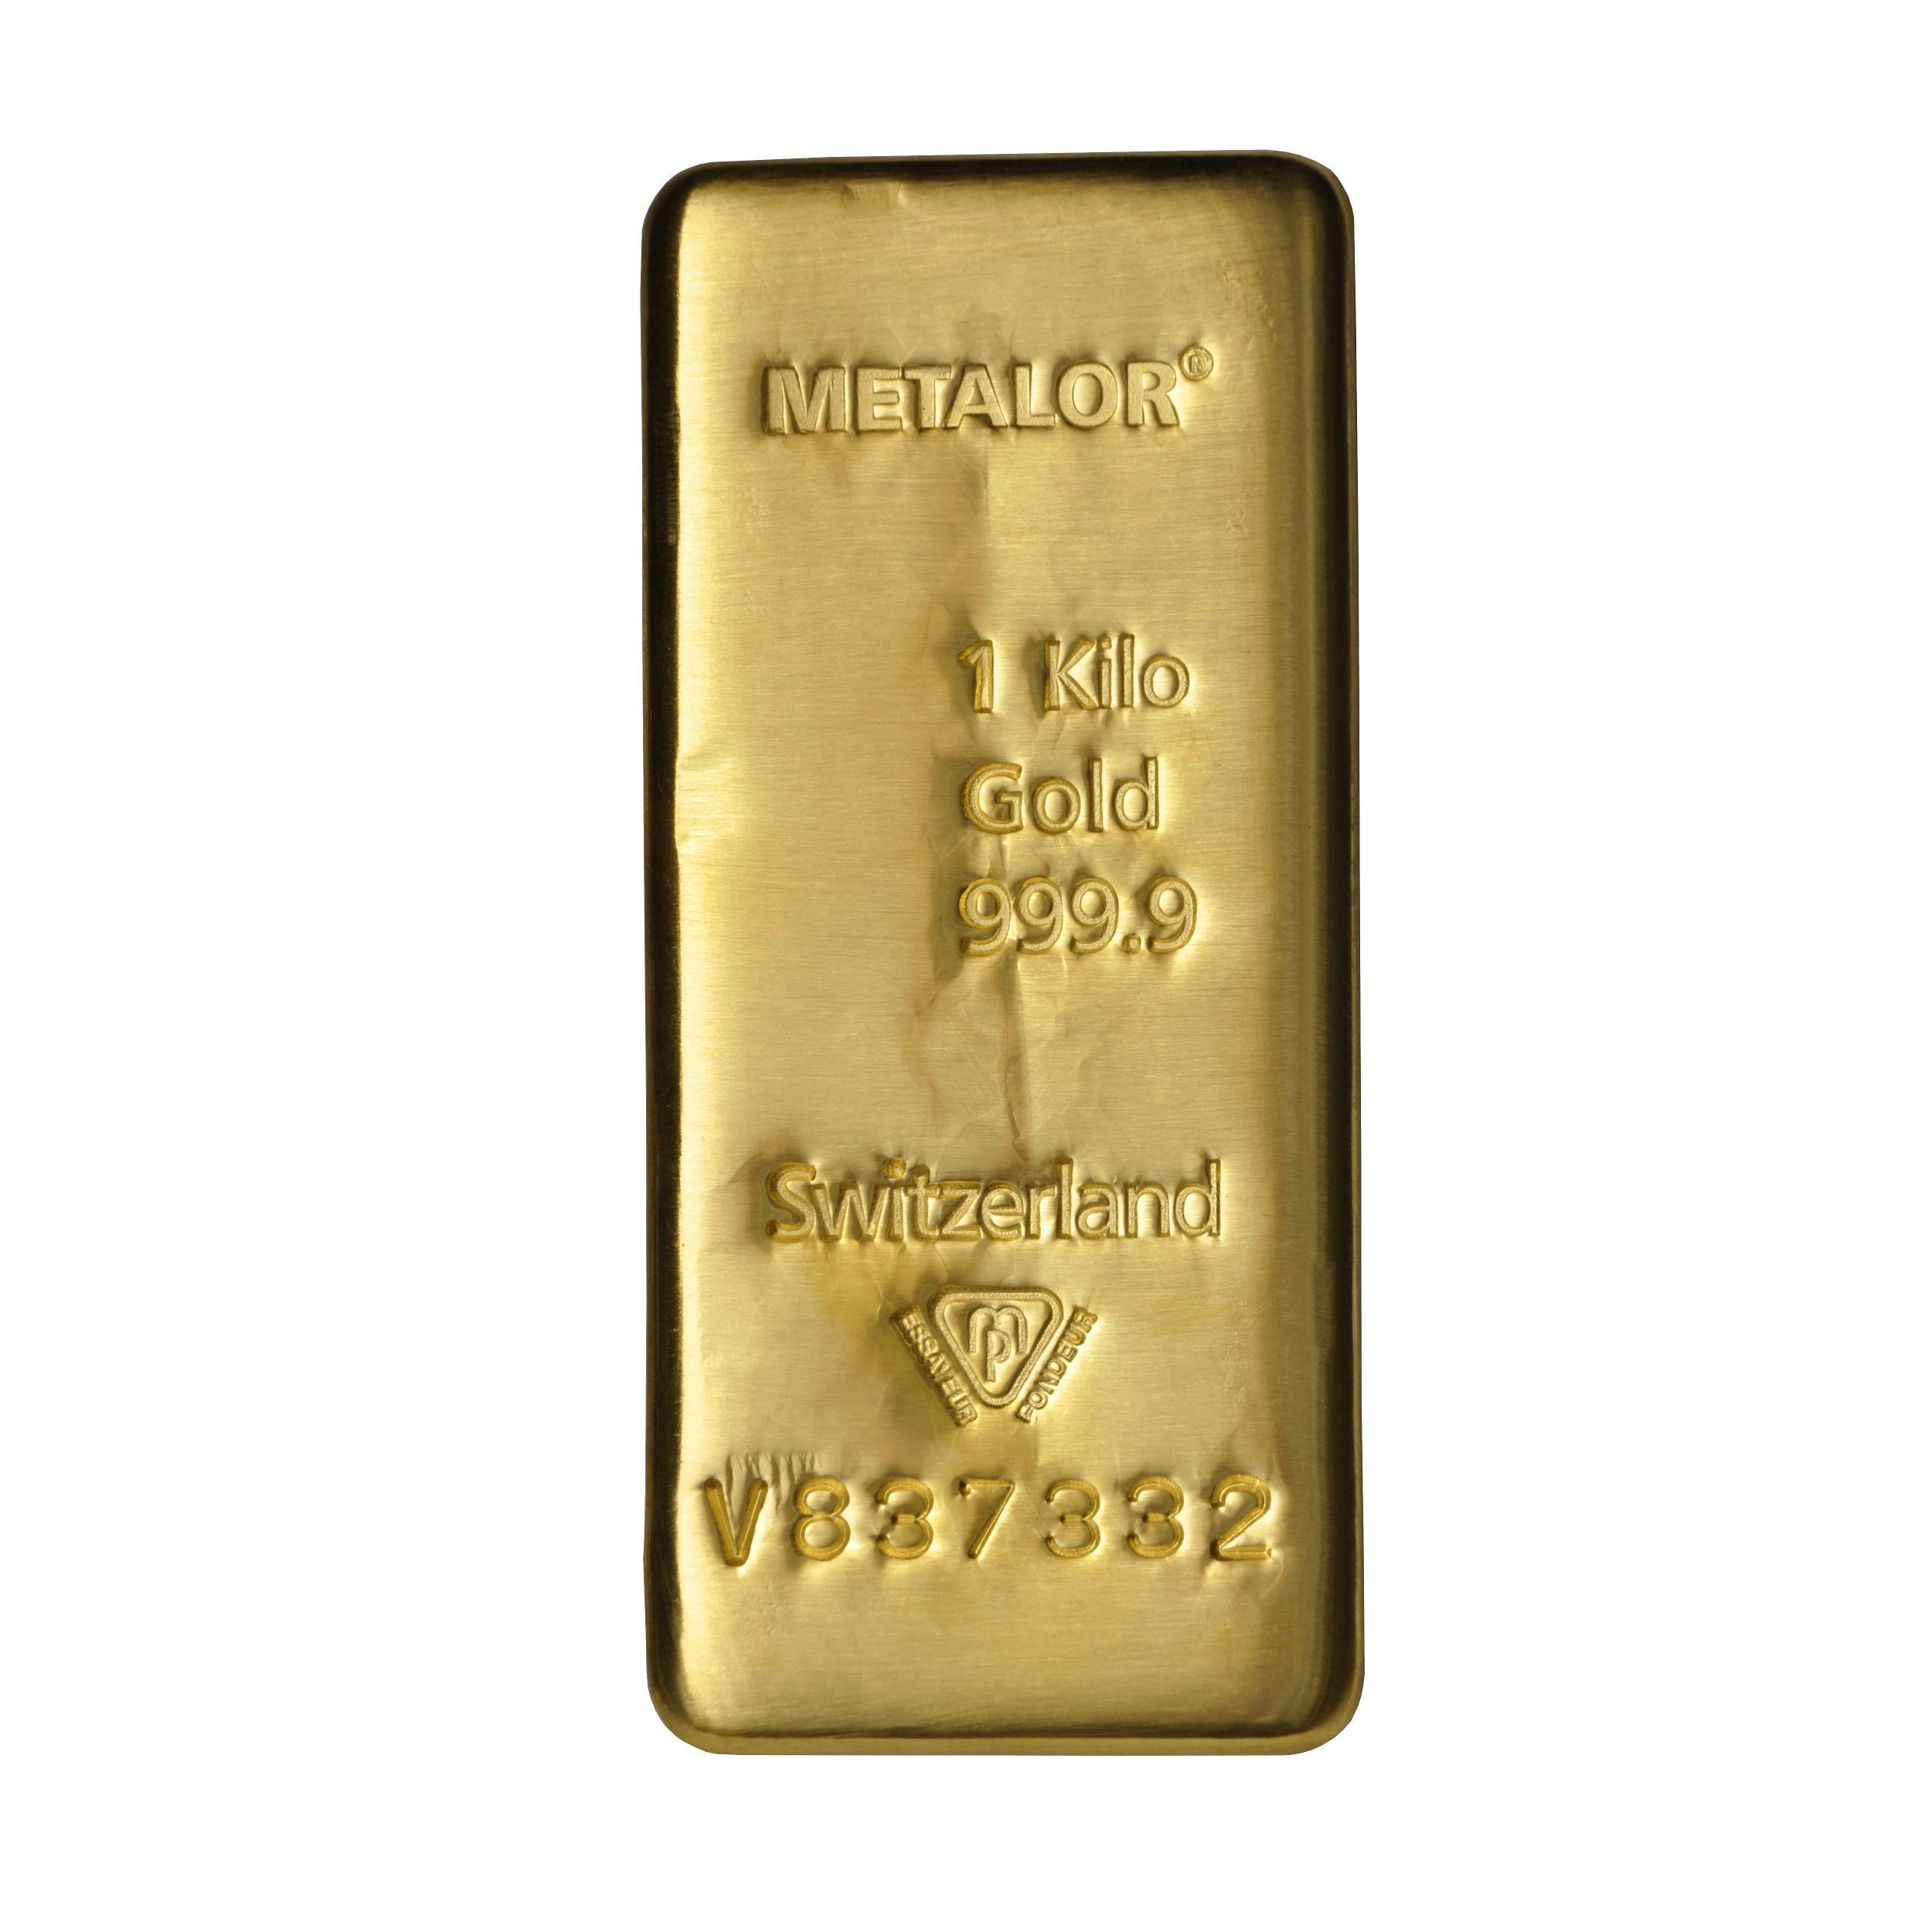 Metalor 1 Kilo Gold Bullion Bar